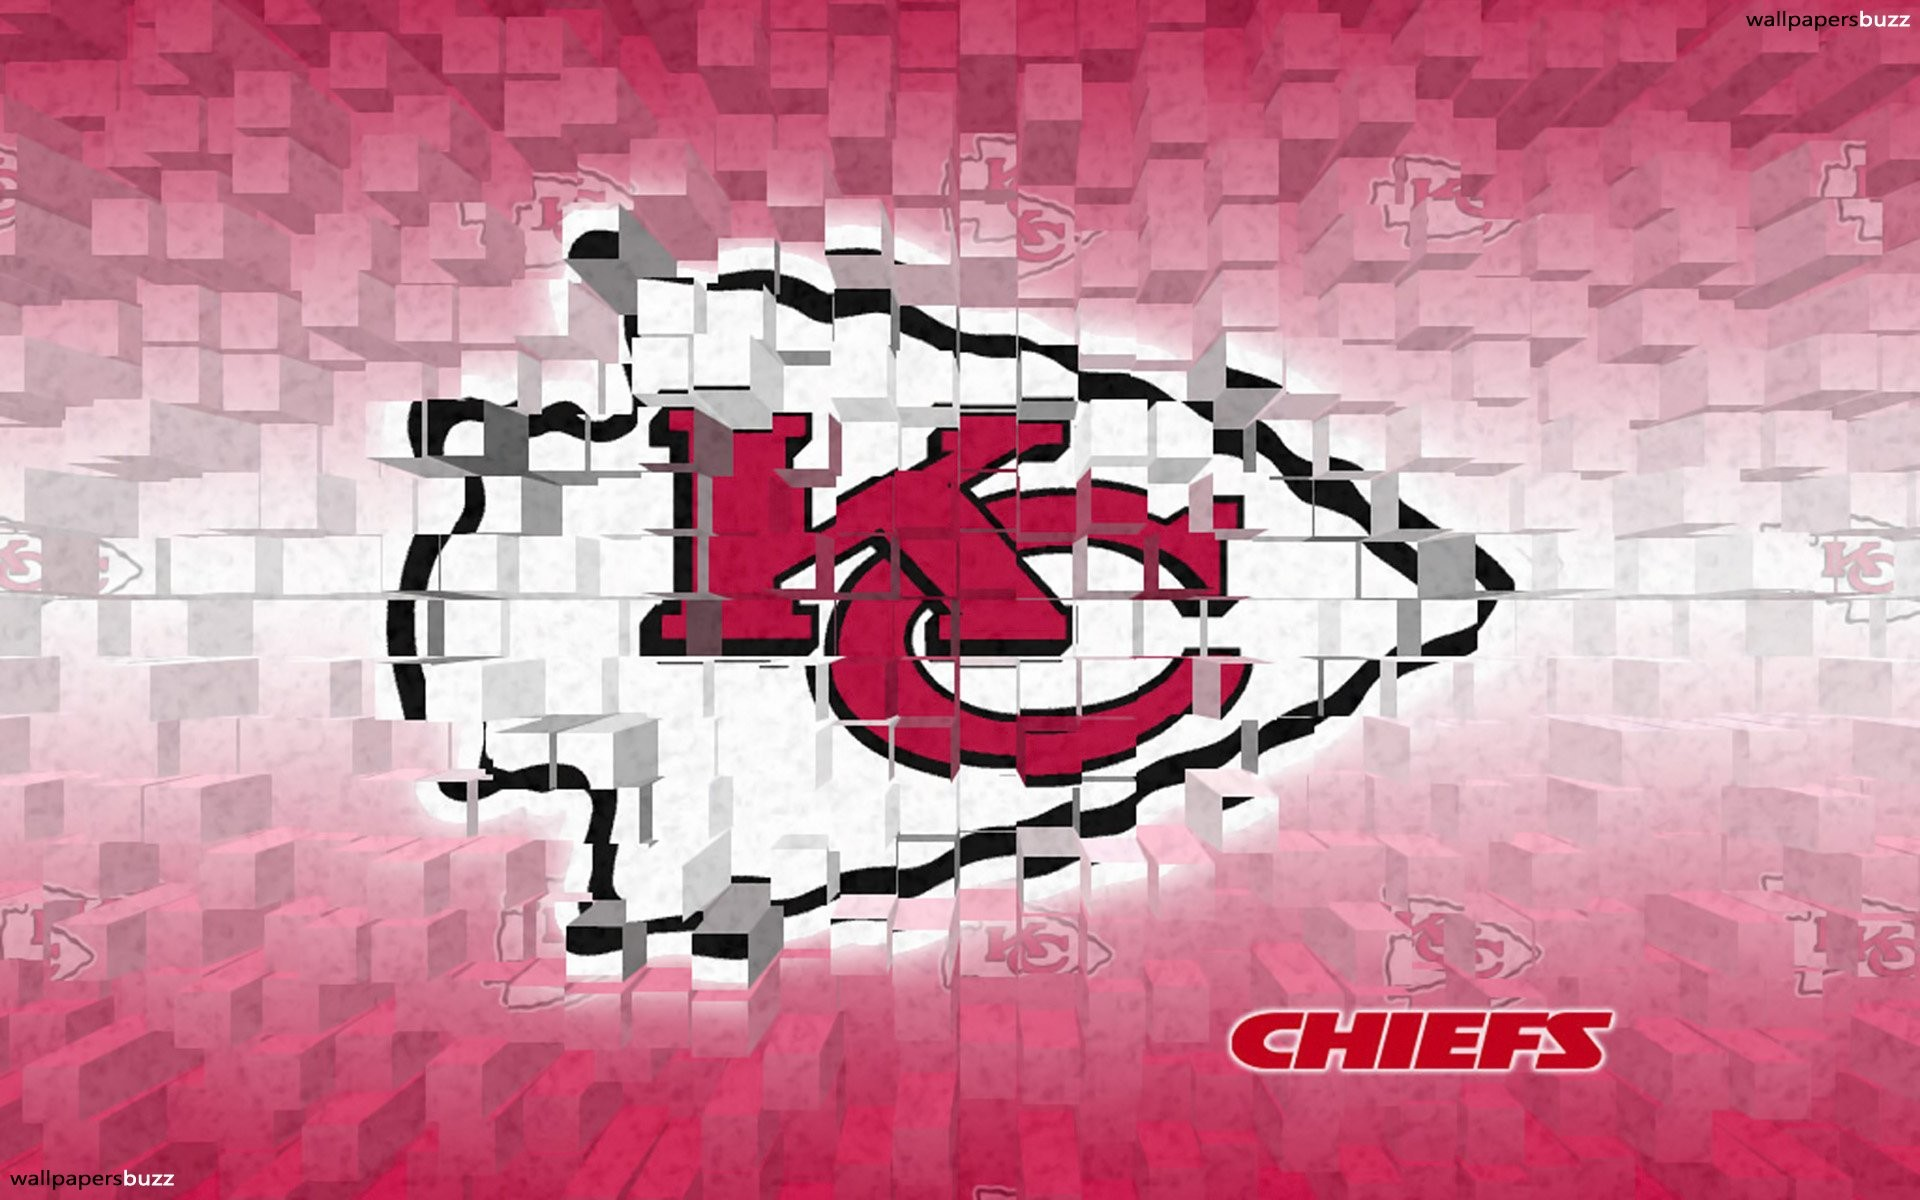 60 Kc Chiefs Wallpaper And Screensavers